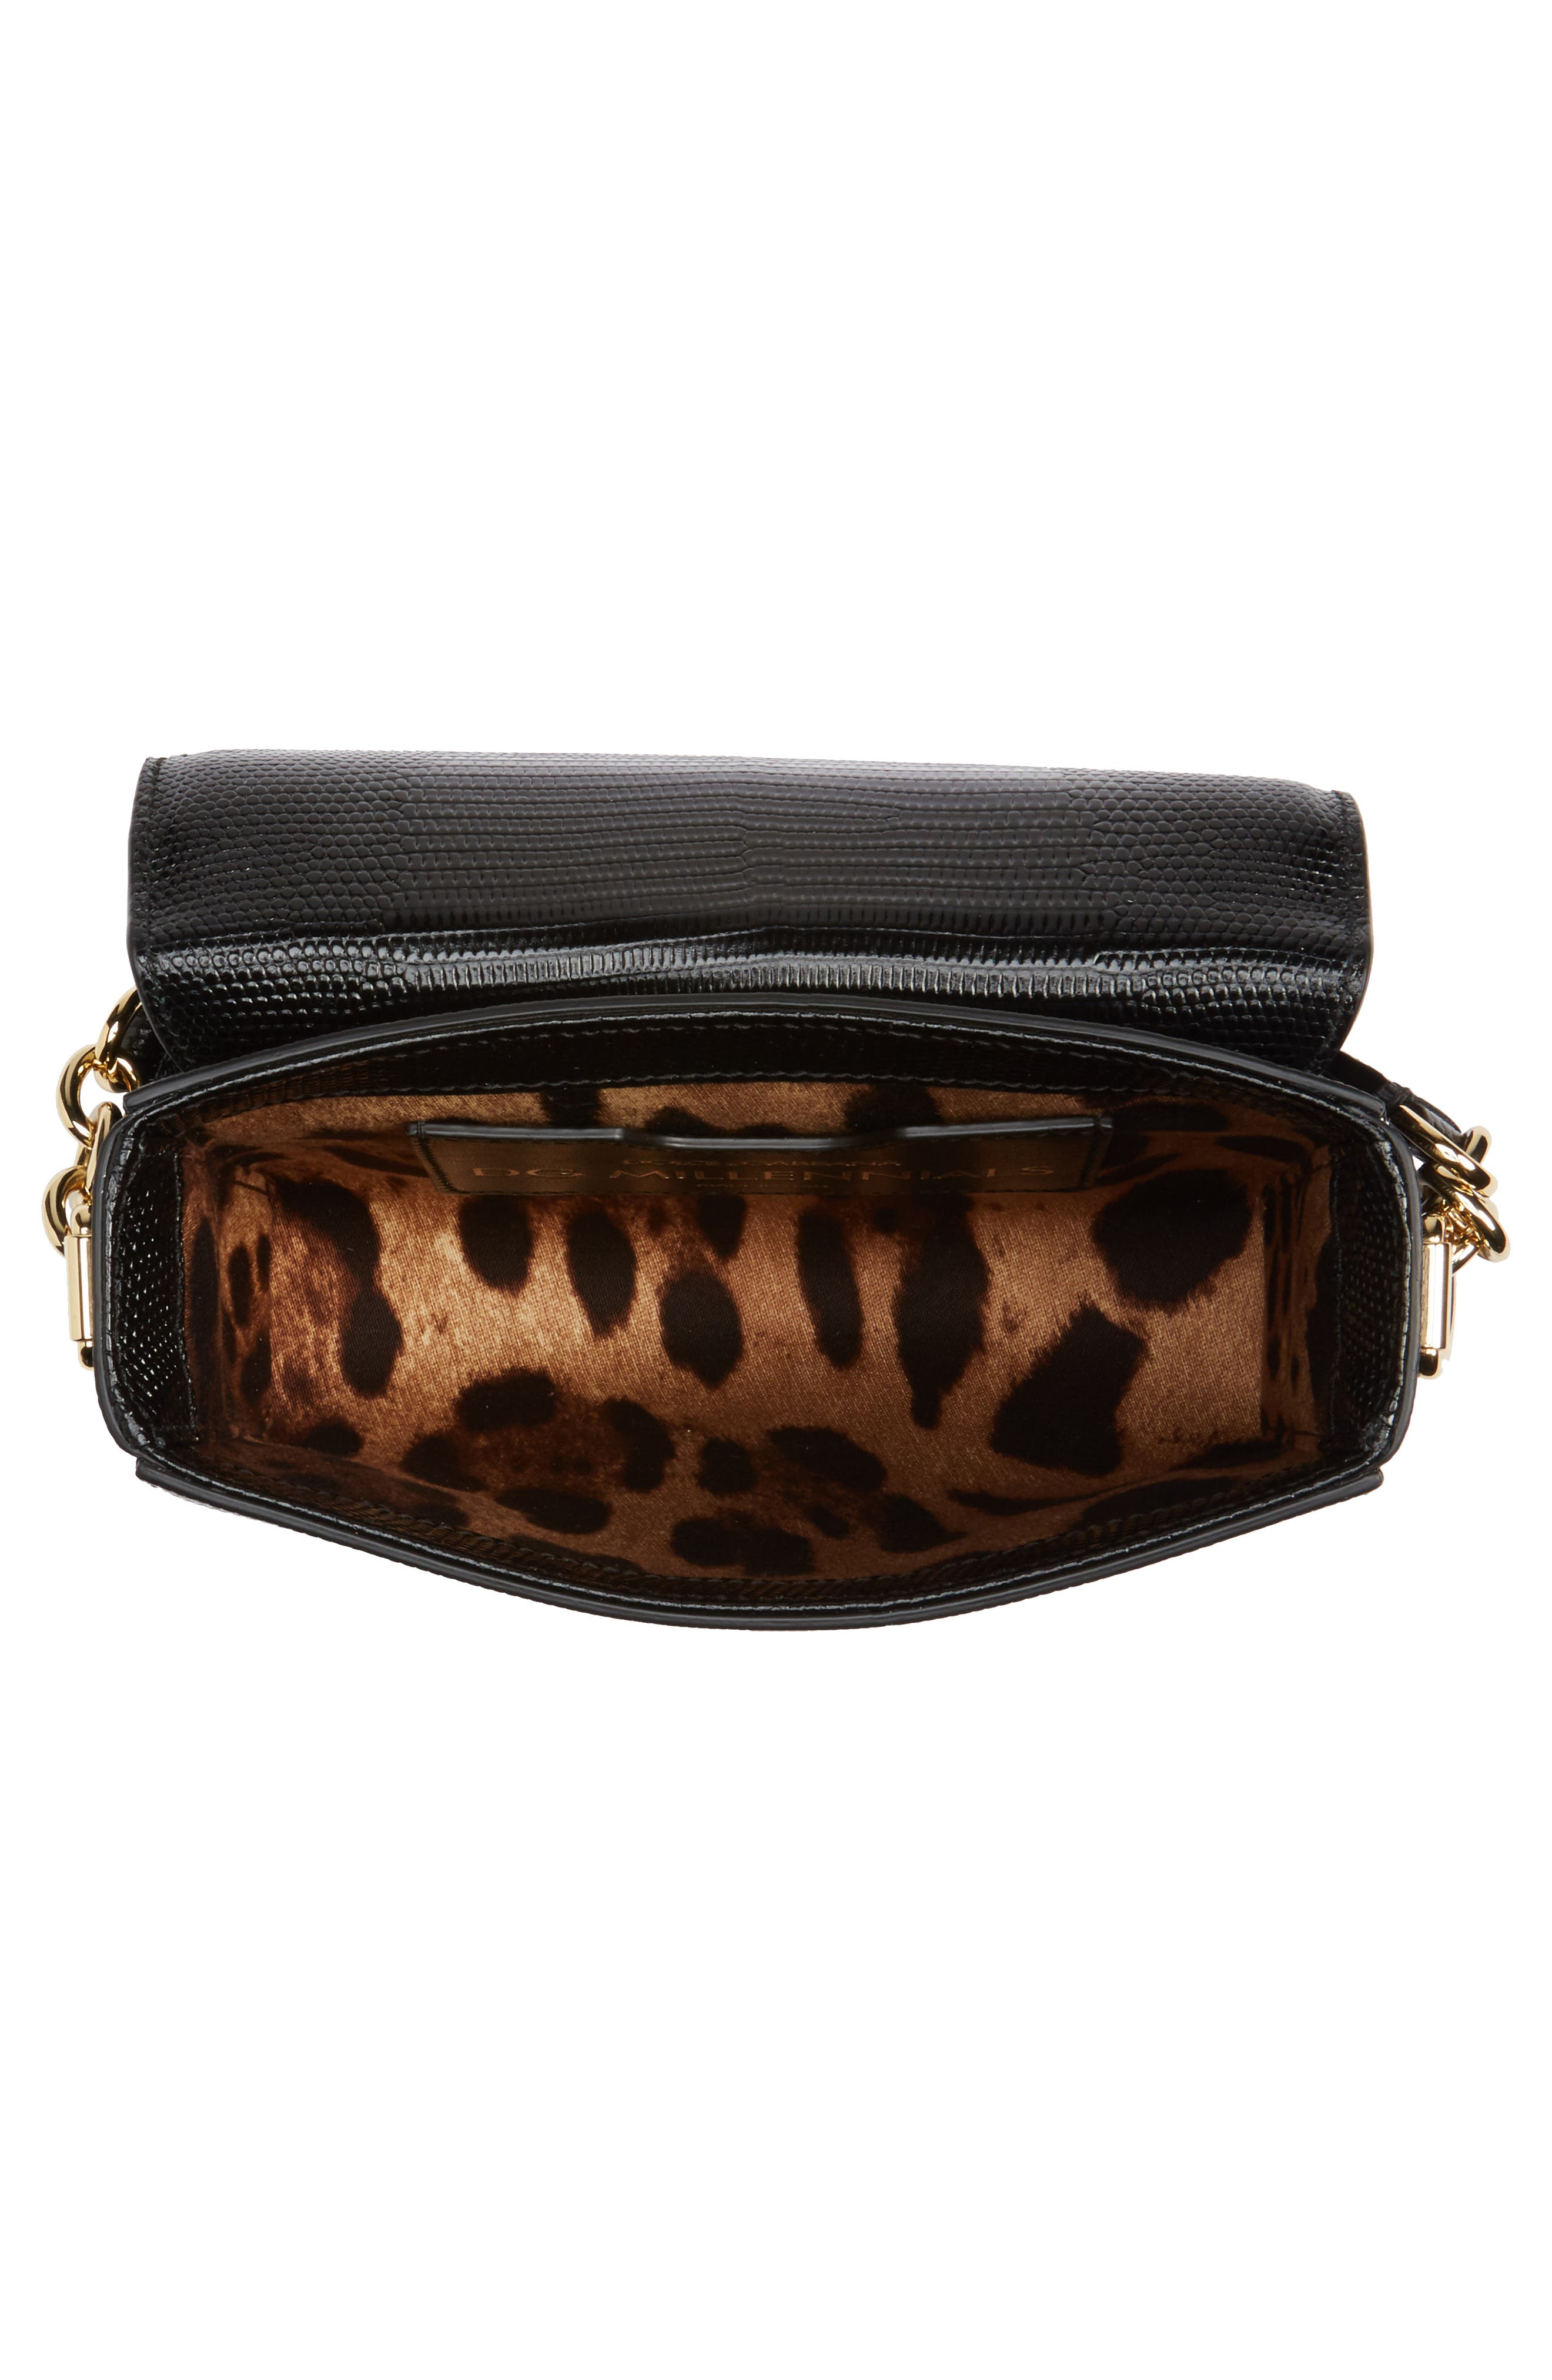 Millennial Reptile Embossed Leather Crossbody Bag,                             Alternate thumbnail 4, color,                             NERO